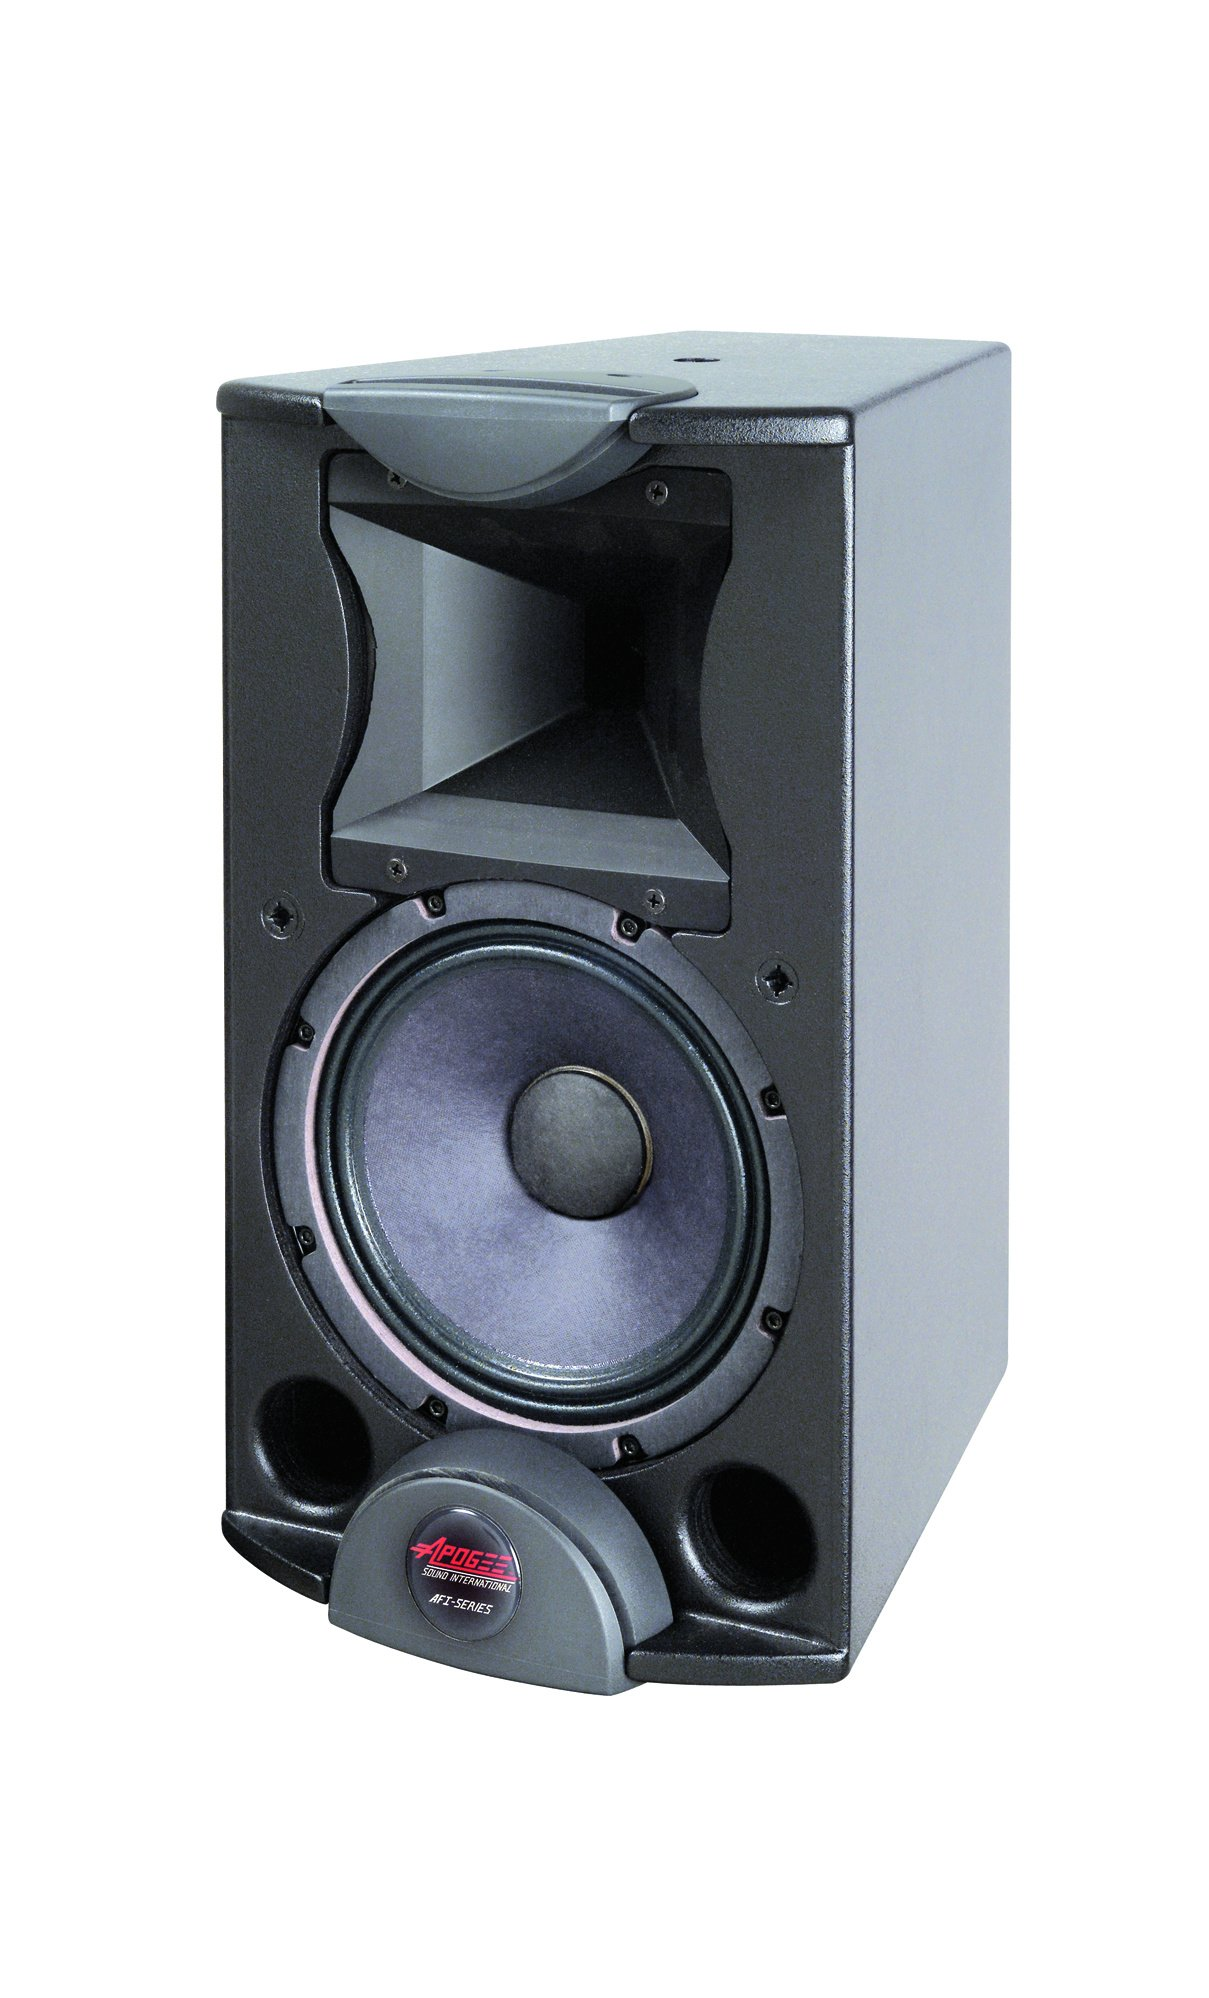 Apogee Sound (Bogen) AFI-1s2 Contractor Series Loudspeaker System, Black Finish 106-0127